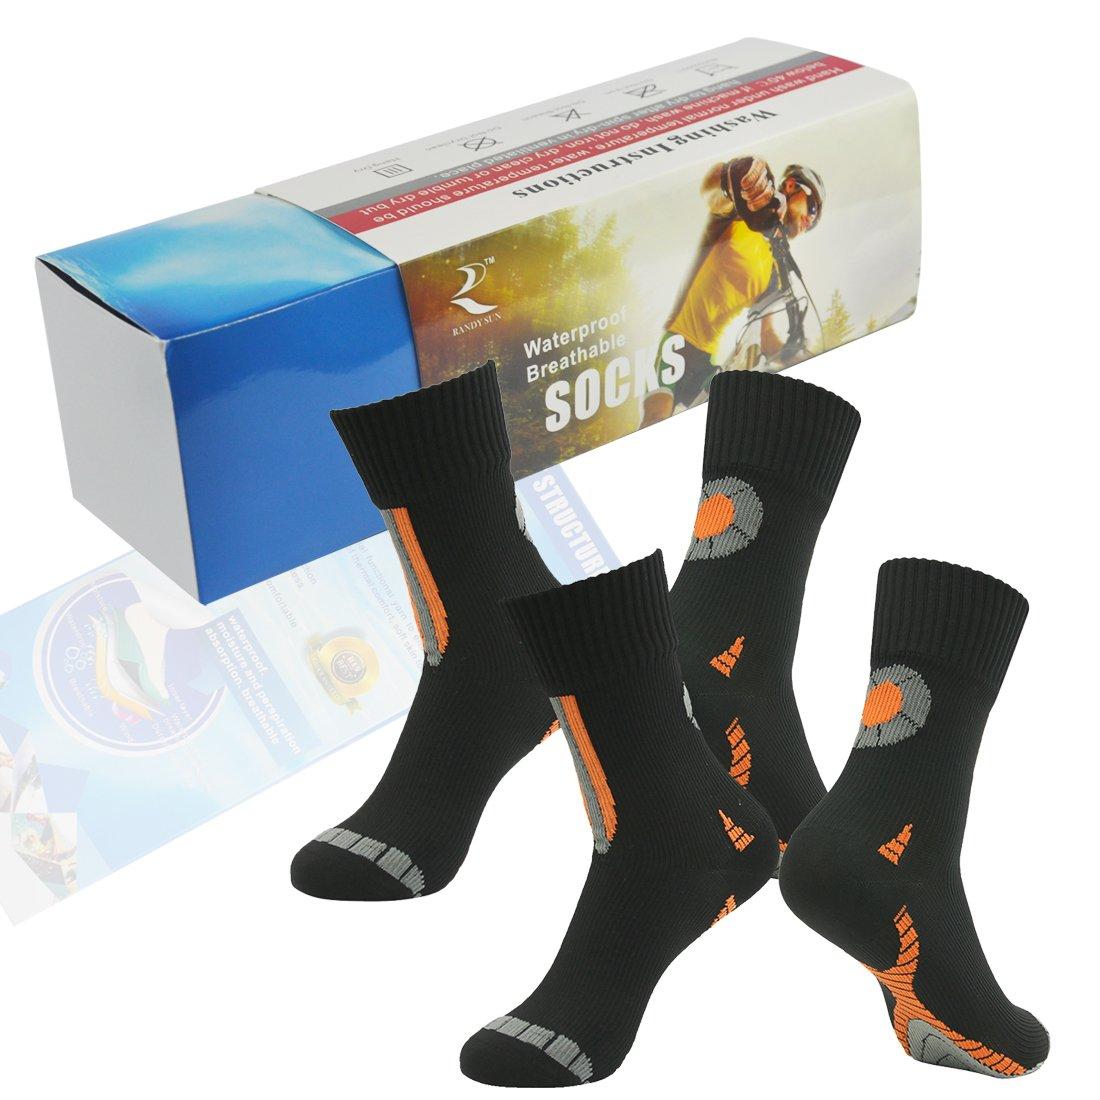 Waterproof Breathable Socks, RANDY SUN Women's 2 Pairs Performance Top Colorful Trail Socks Novelty Socks Black Size S by RANDY SUN